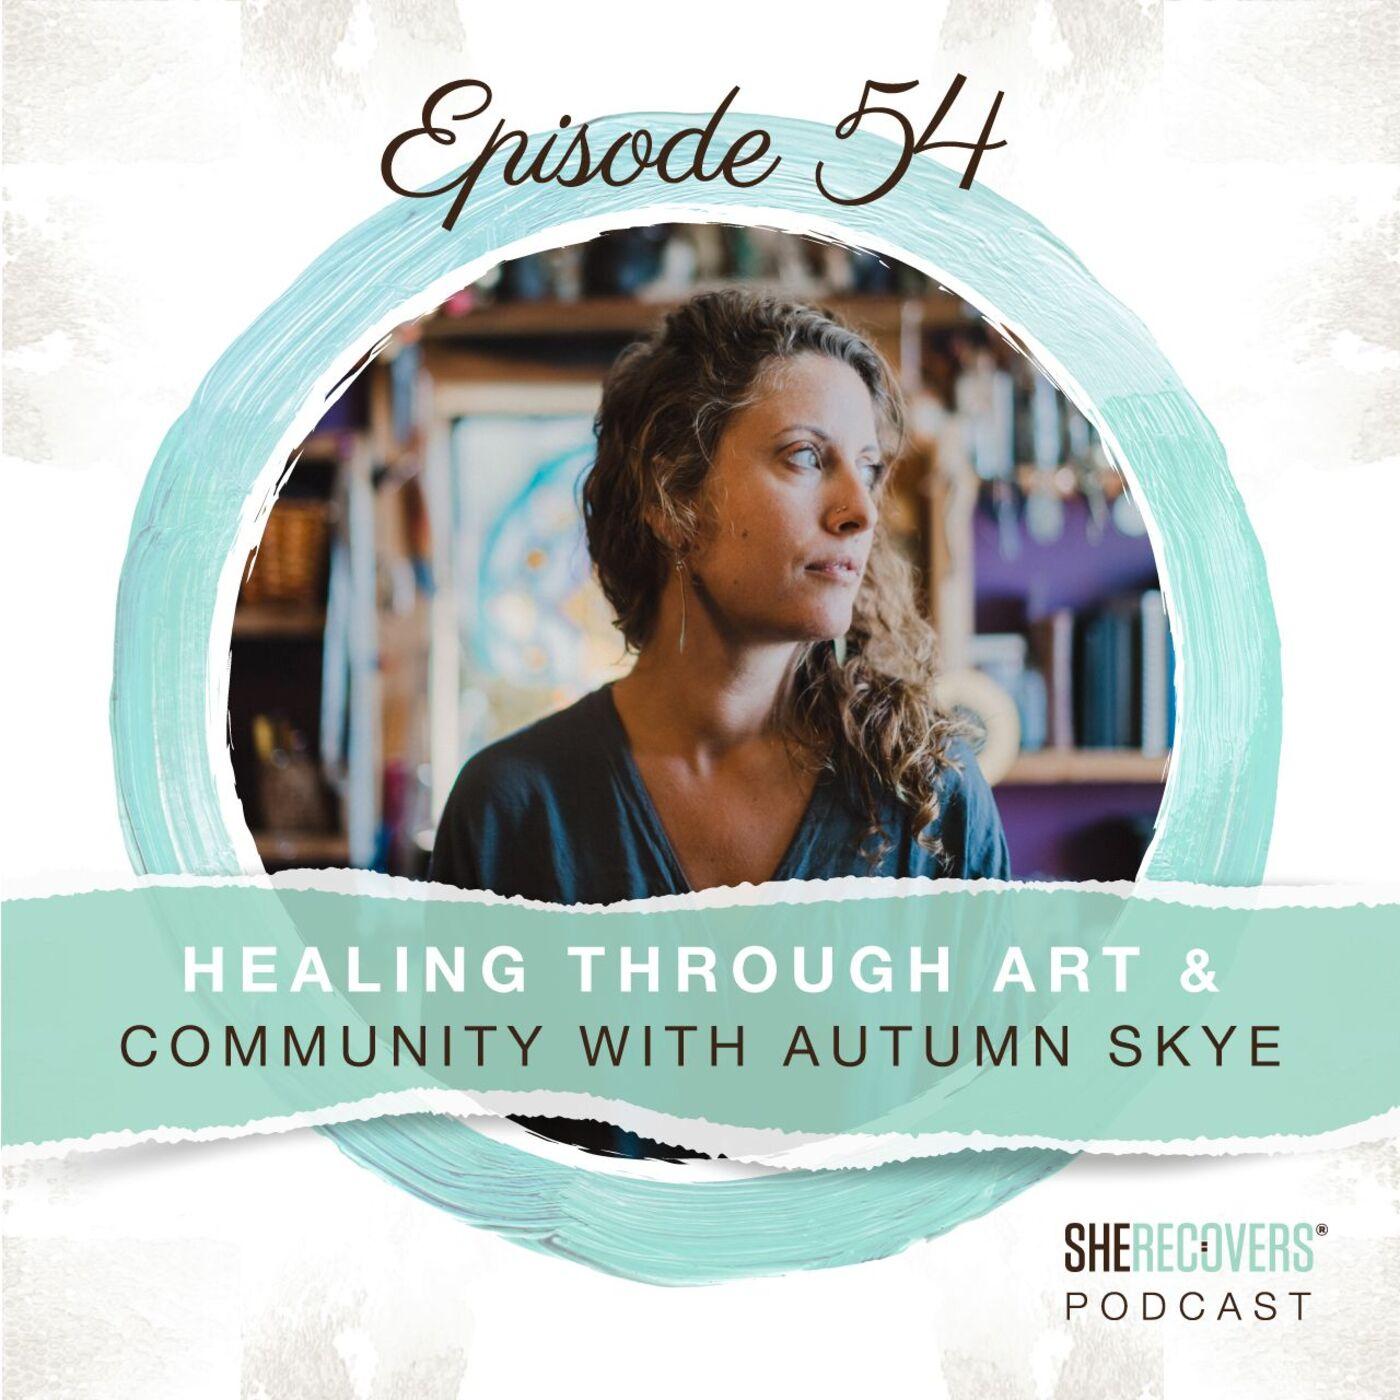 Episode 54: Healing Through Art & Community with Autumn Skye